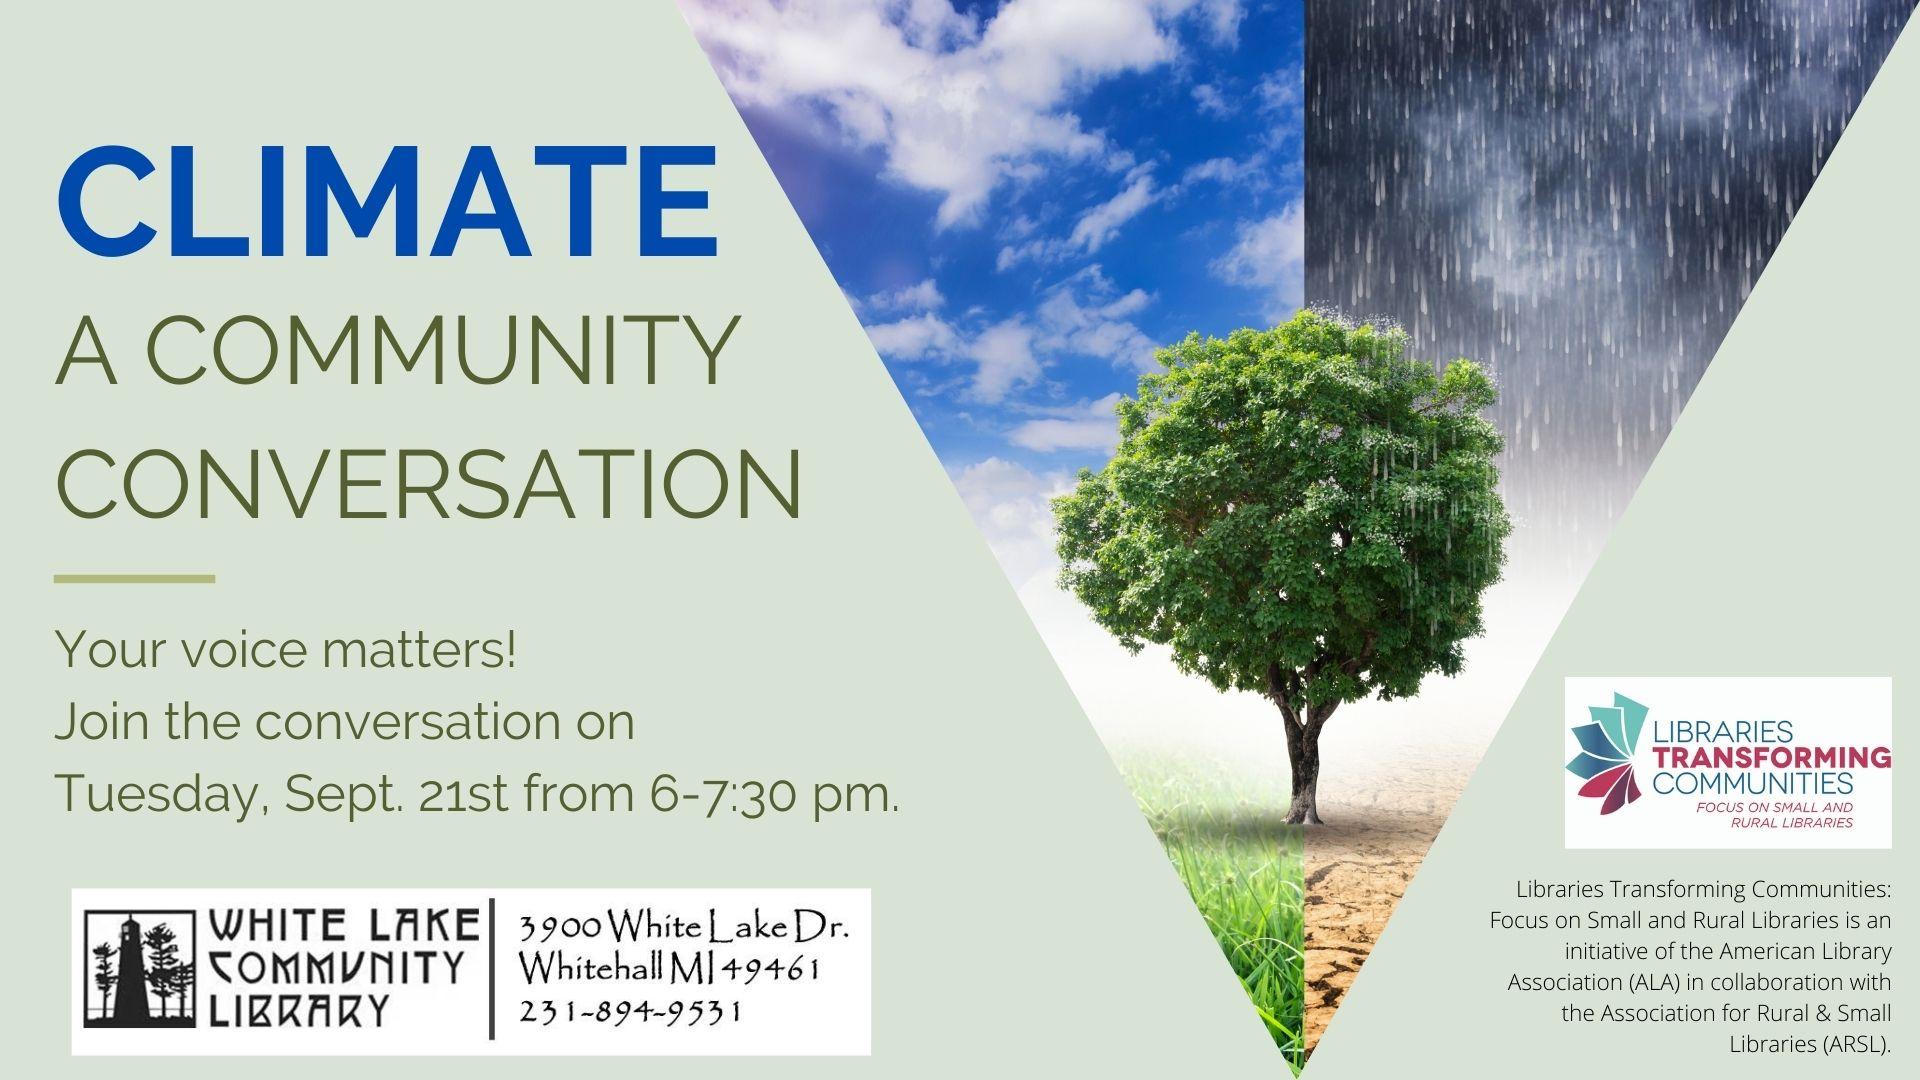 Community Conversation on Climate